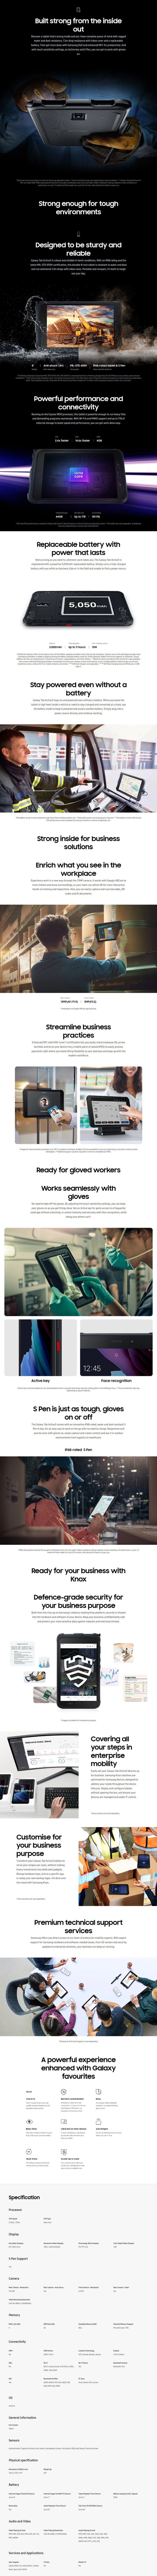 "Samsung Galaxy Tab Active 3 8"" 64GB Wi-Fi - Black - Overview 1"